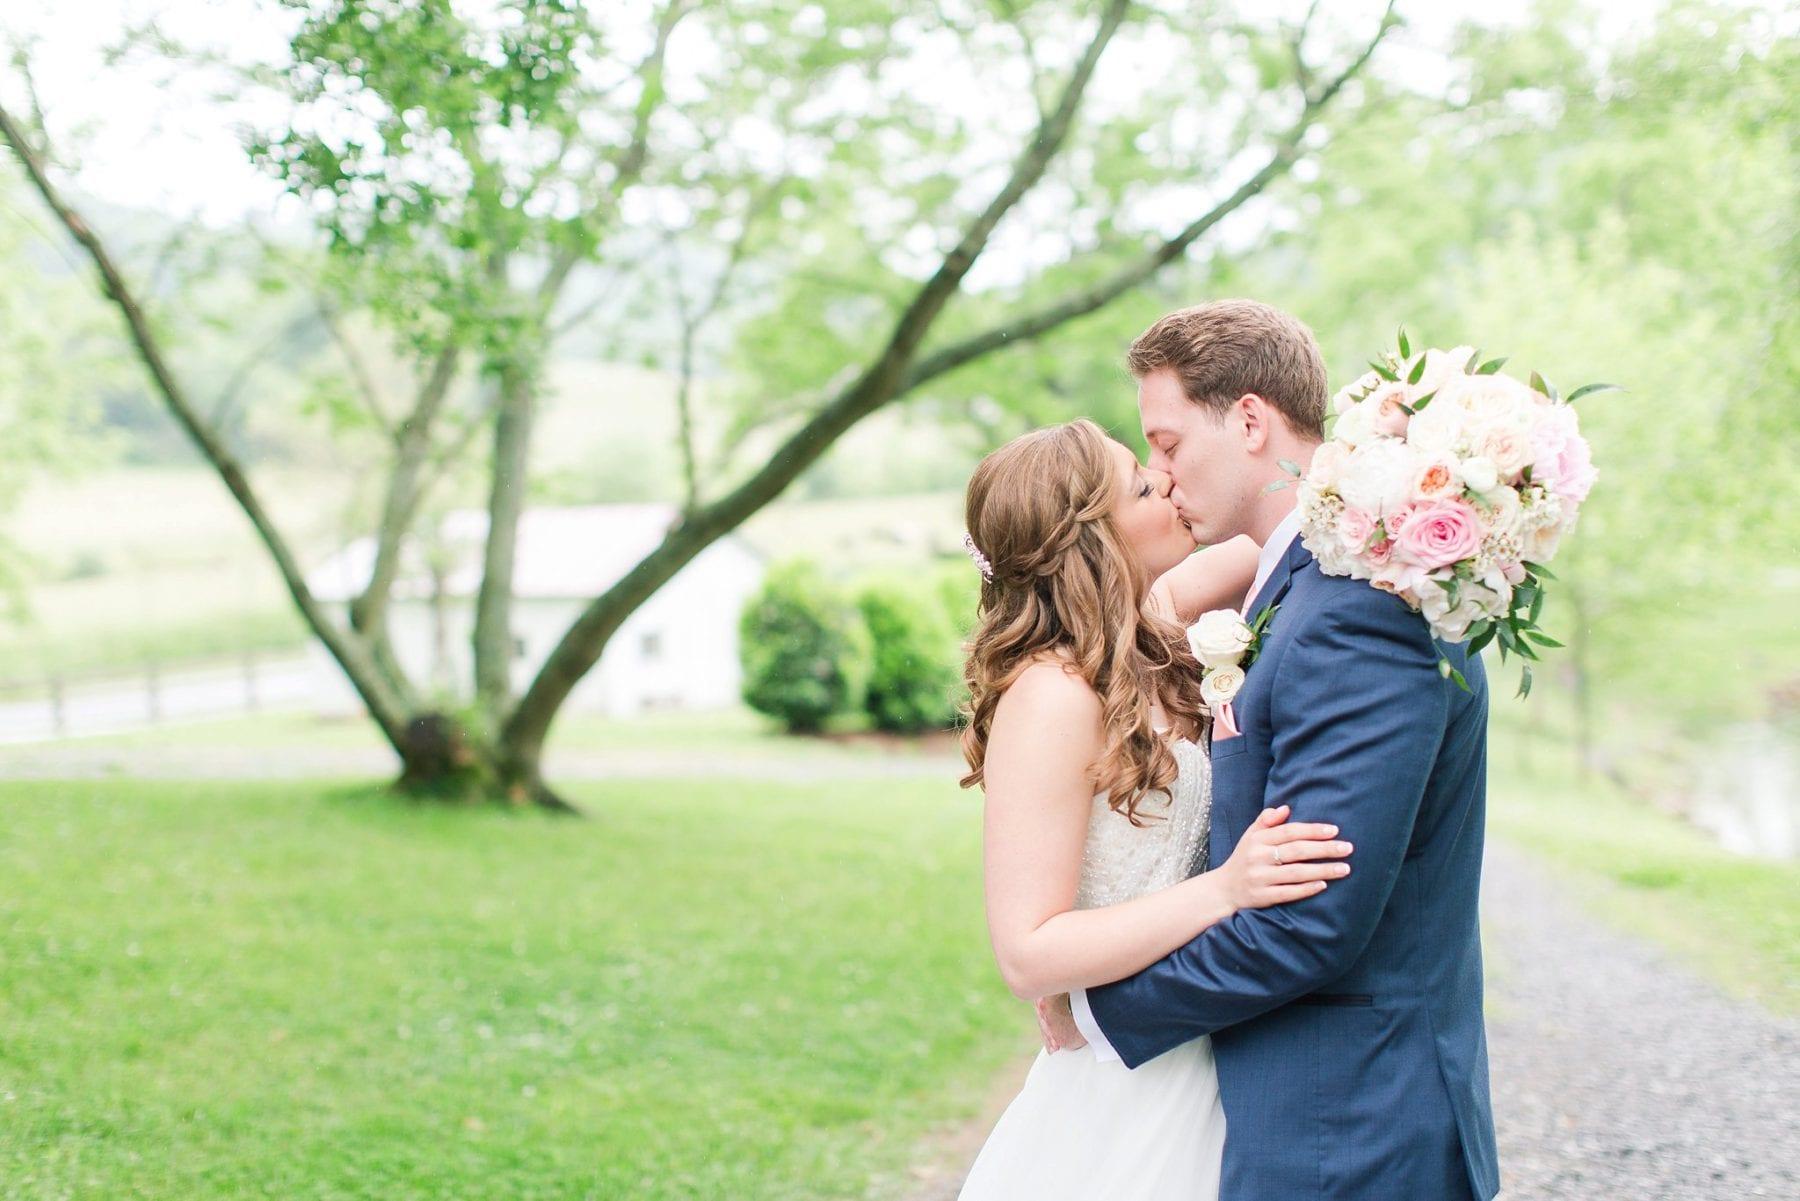 Justin & Megan Big Spring Farm Wedding Photos-124.jpg